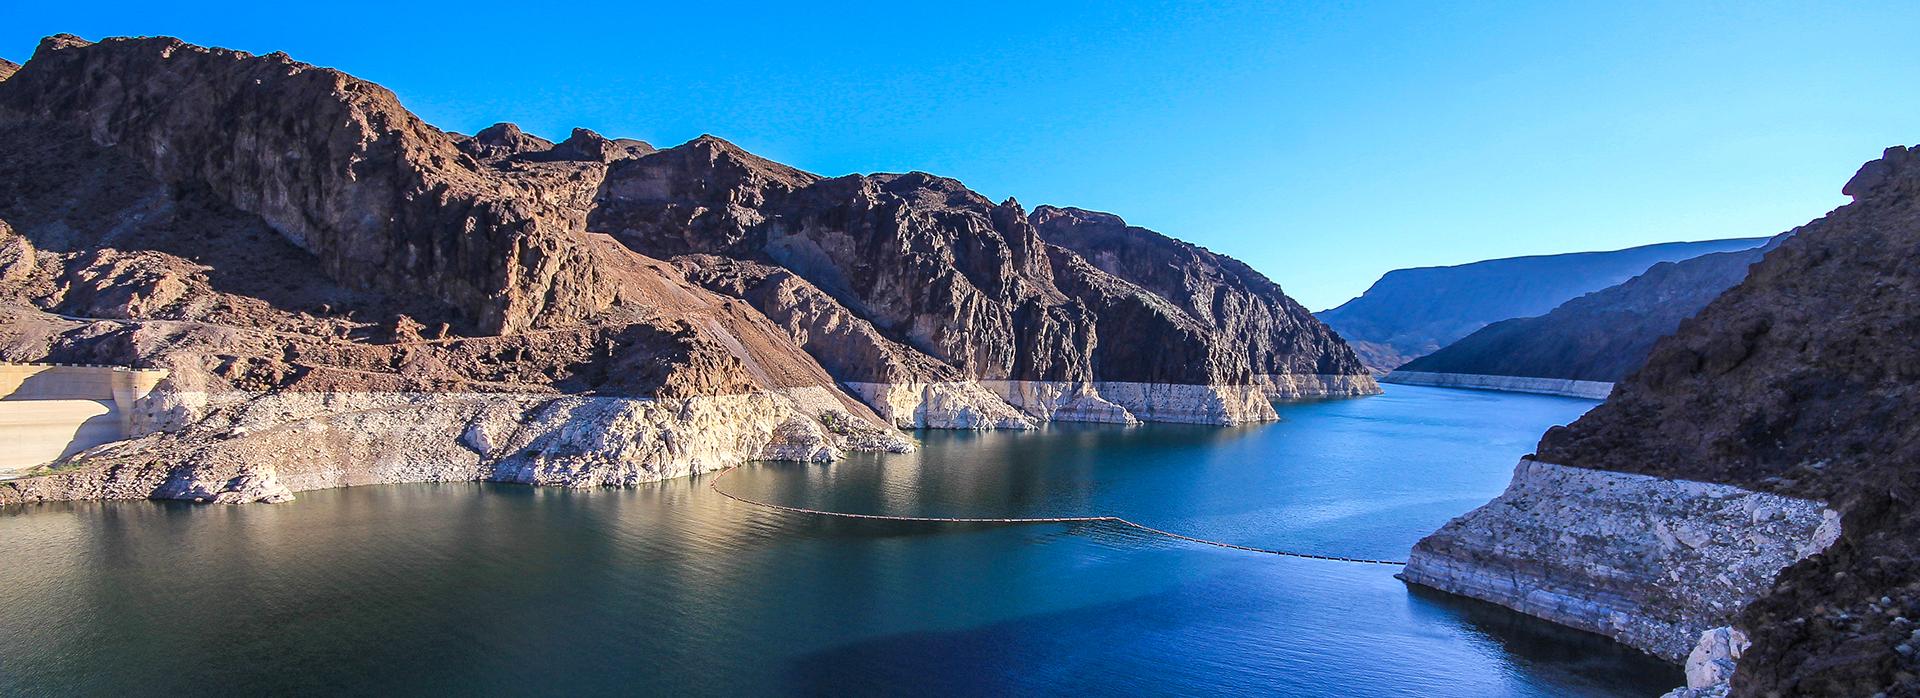 Colorado River Lake Mead close to Hoover Dam